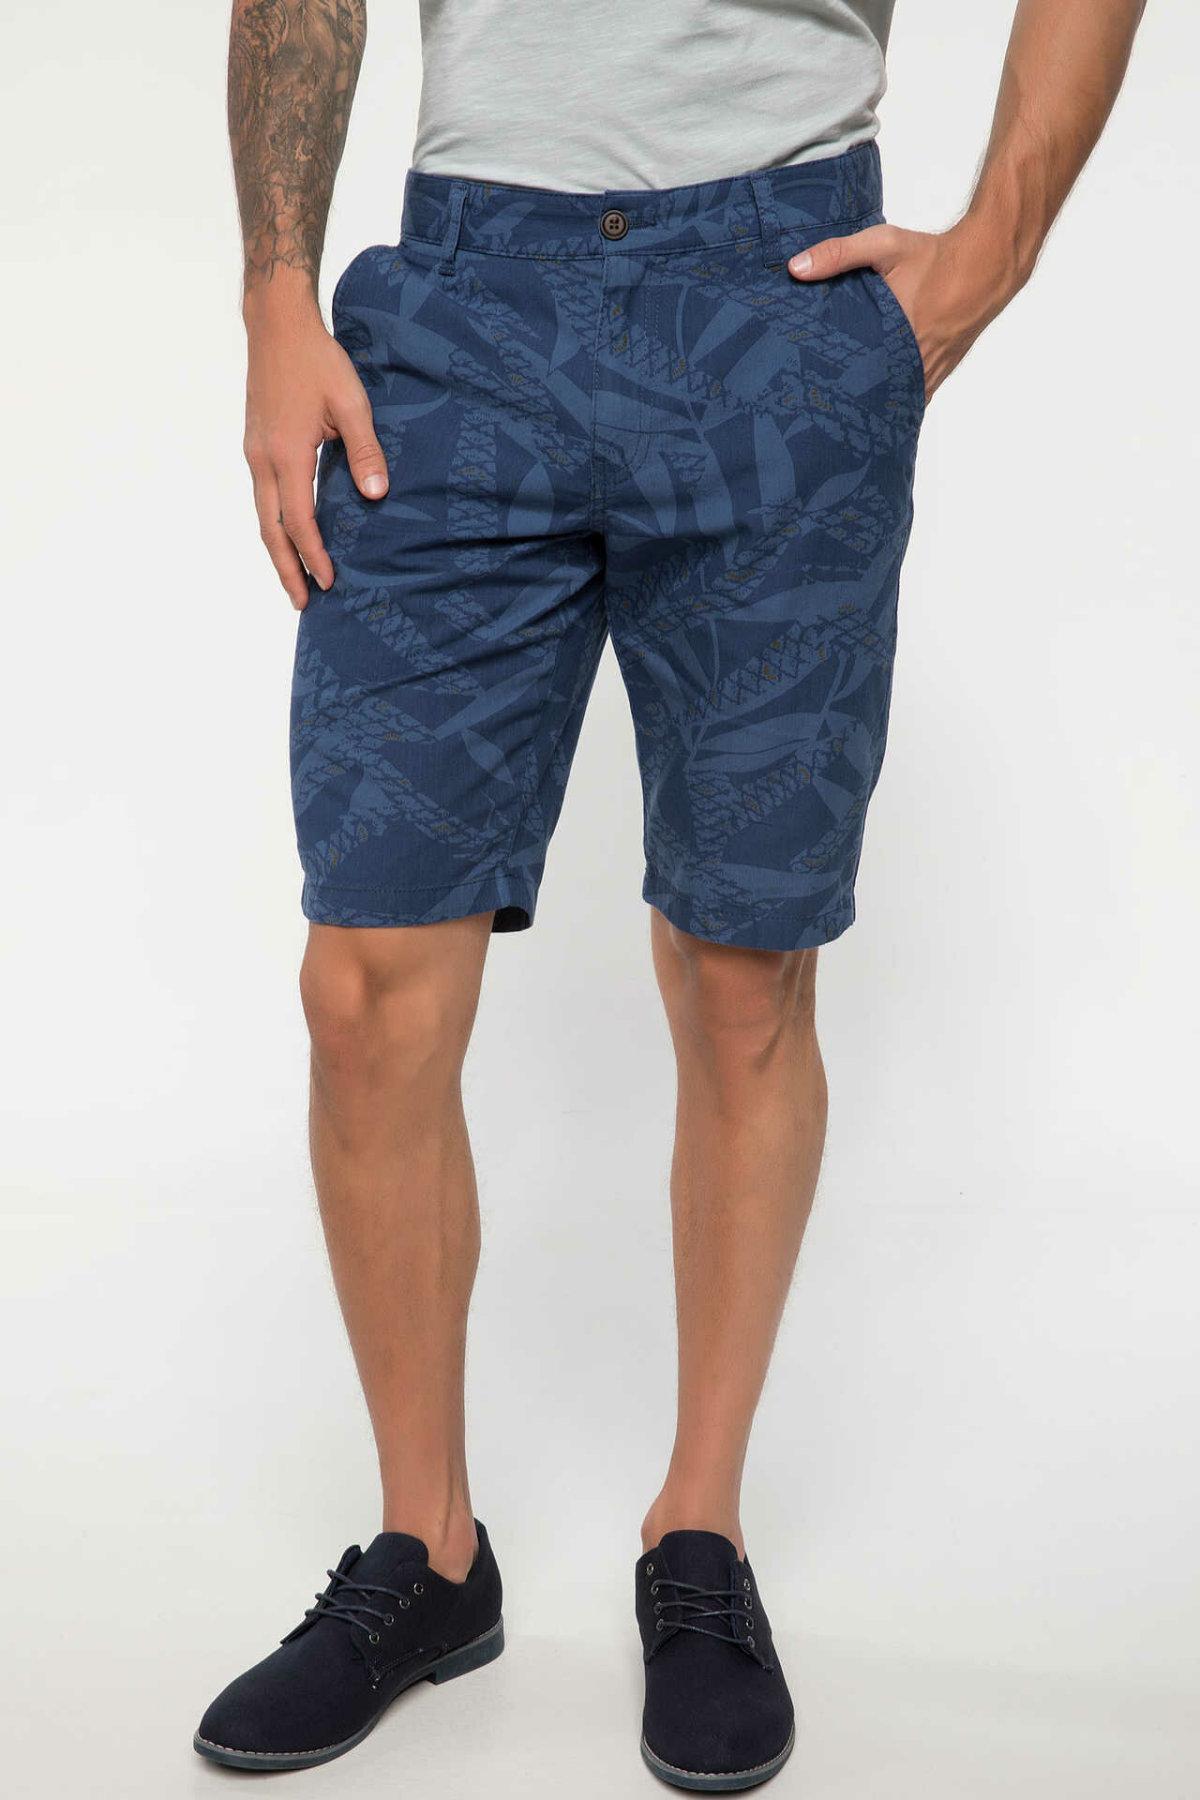 DeFacto Man Summer Dark Color Casual Shorts Men Mid-waist Blue Shorts Bottoms Male Loose Bermuda Shorts-I7573AZ18SM